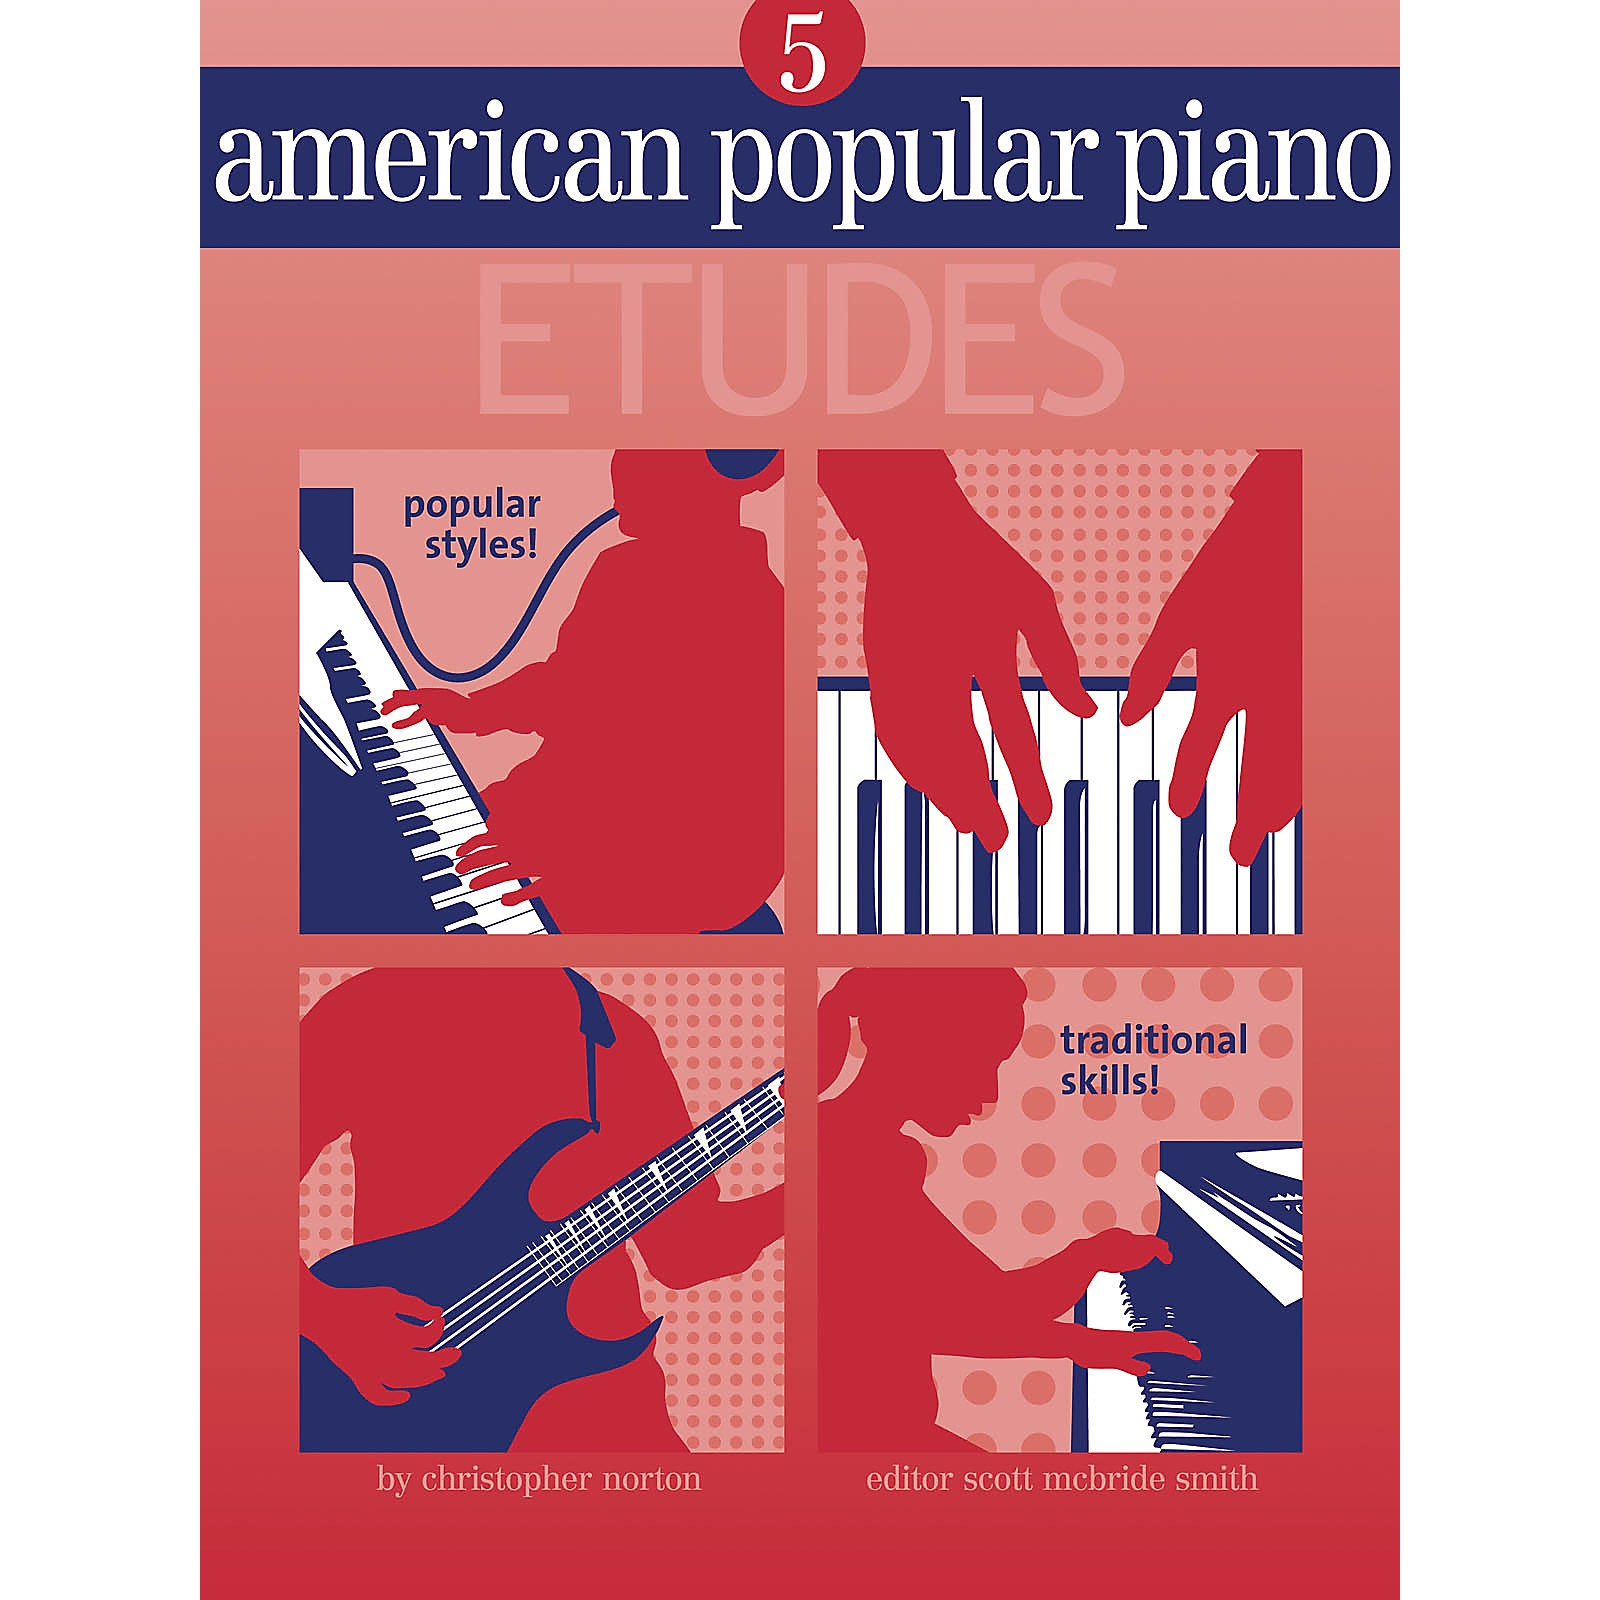 Novus Via American Popular Piano - Etudes Novus Via Music Group Series Softcover Written by Christopher Norton